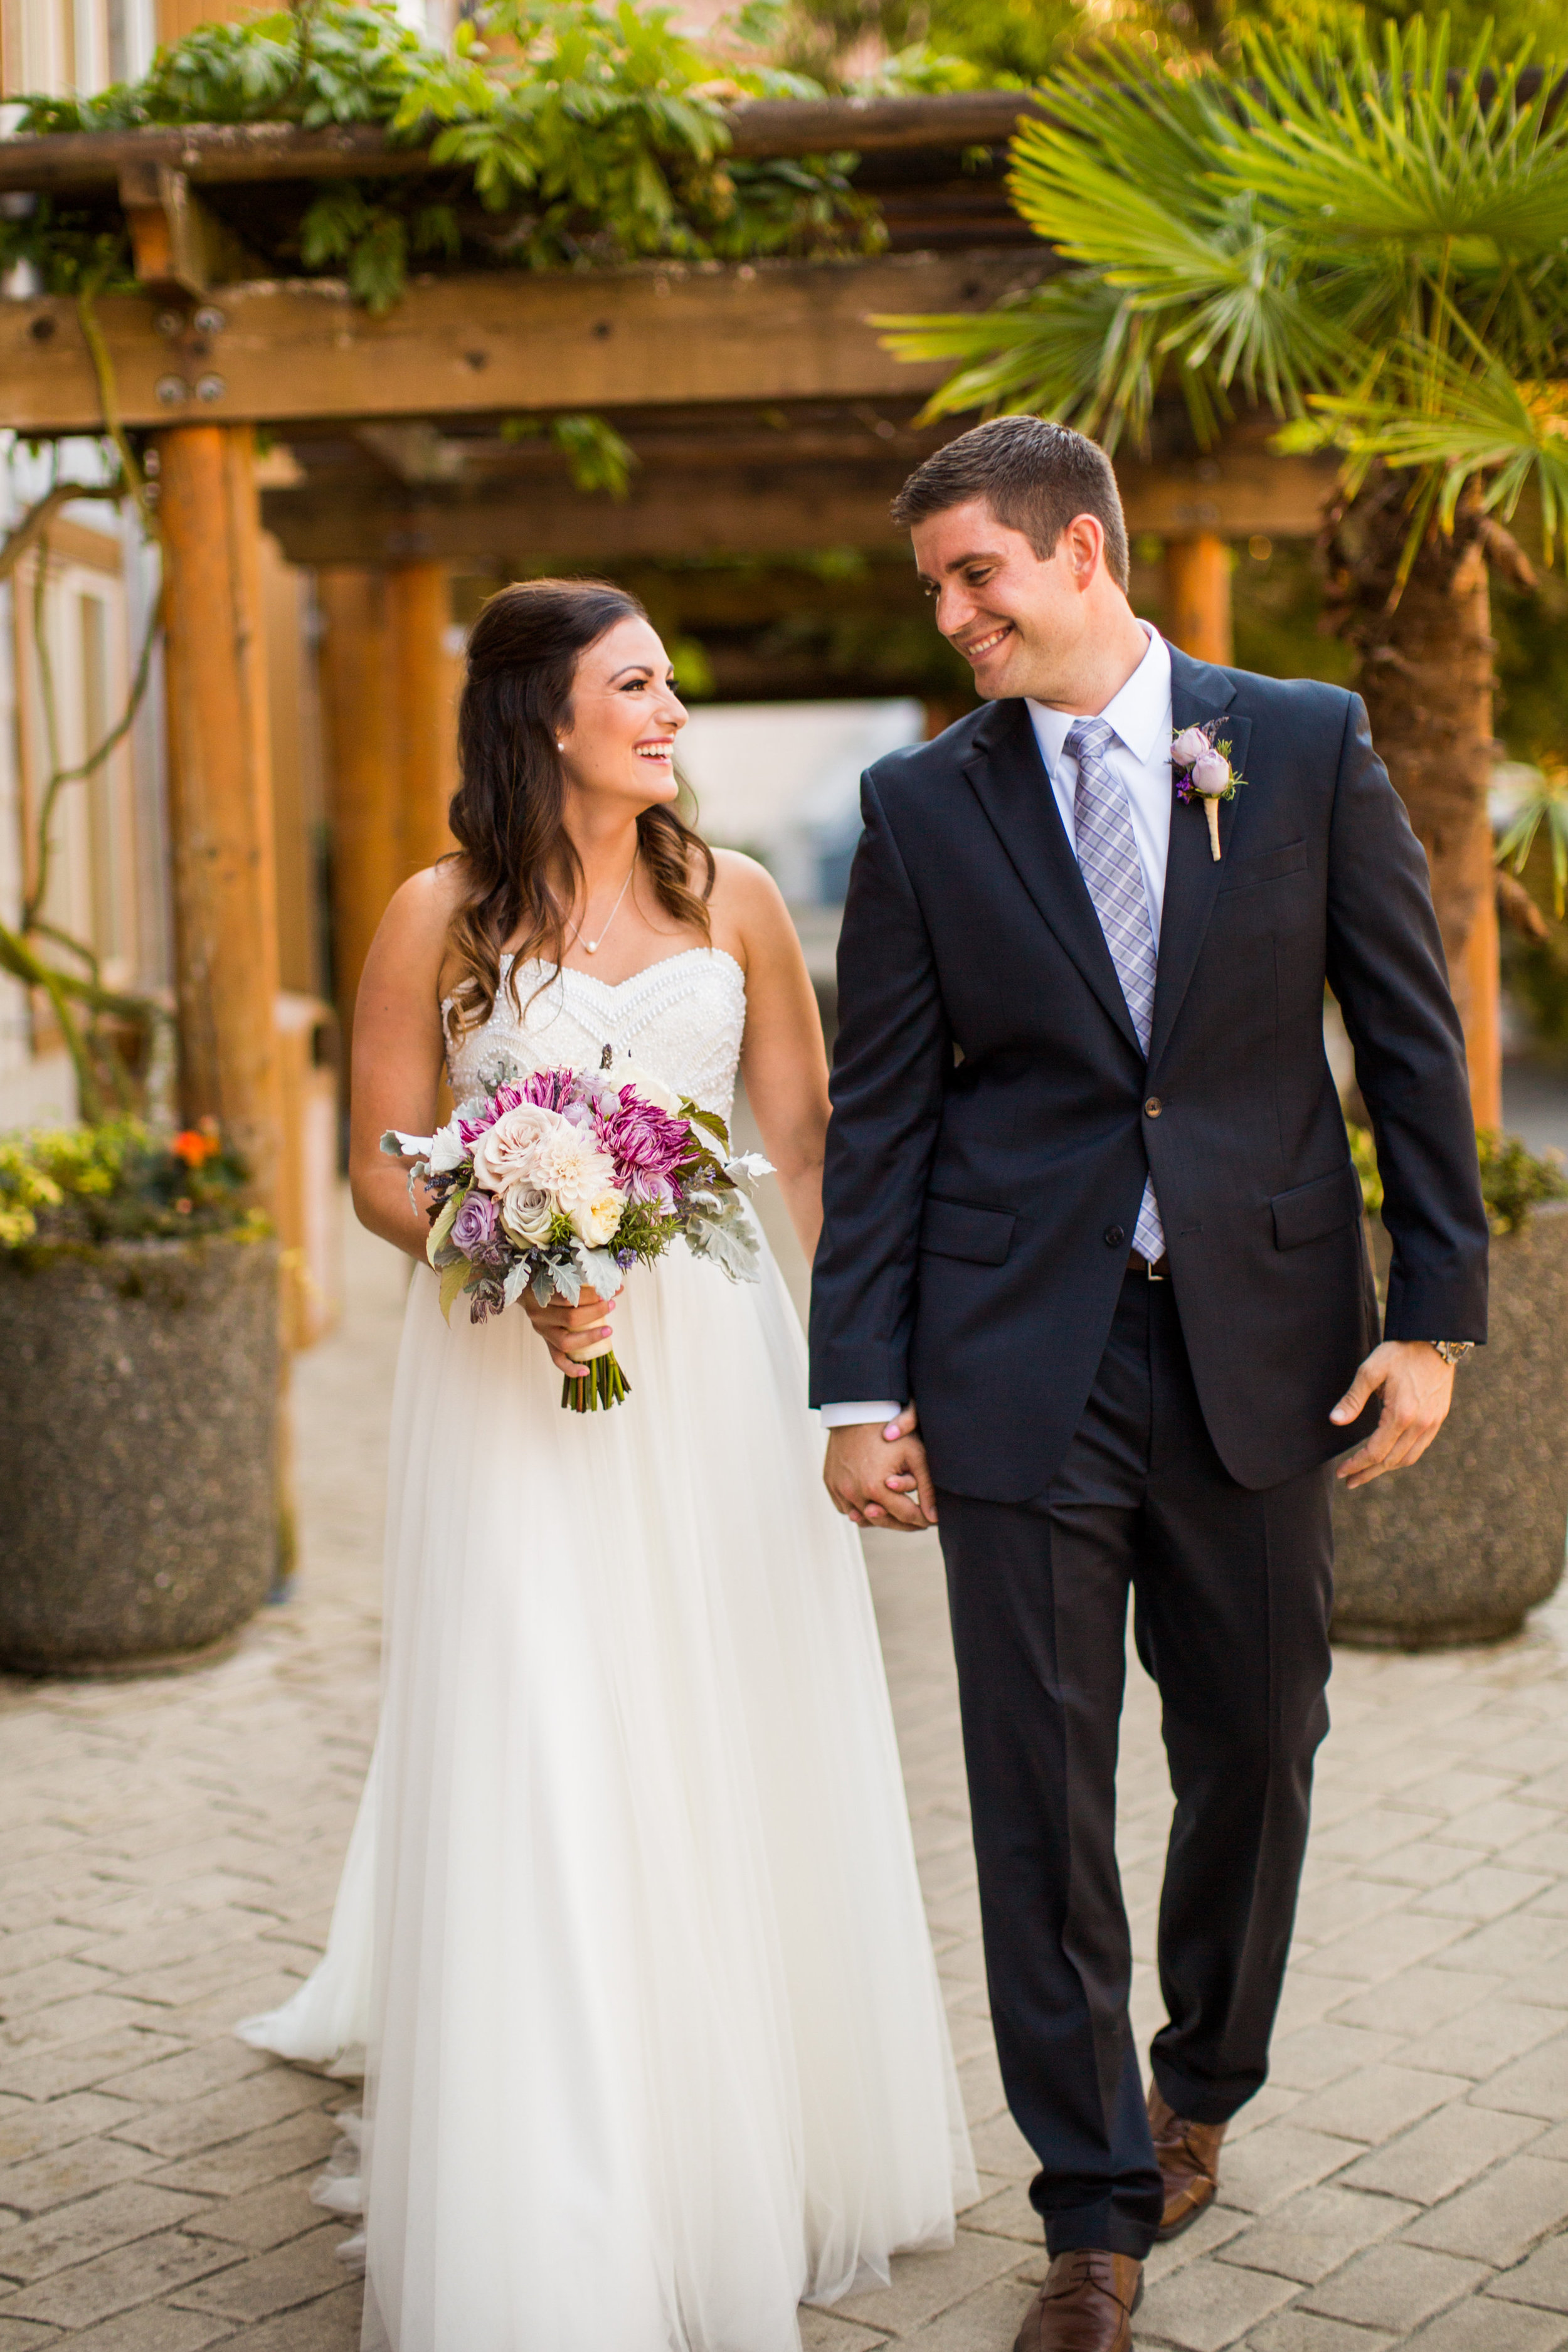 Seattle Wedding Planner, Wedding Wise | Ciccarelli Photography | Edgewater Hotel Wedding | Bride and groom photos | Navy blue wedding suit